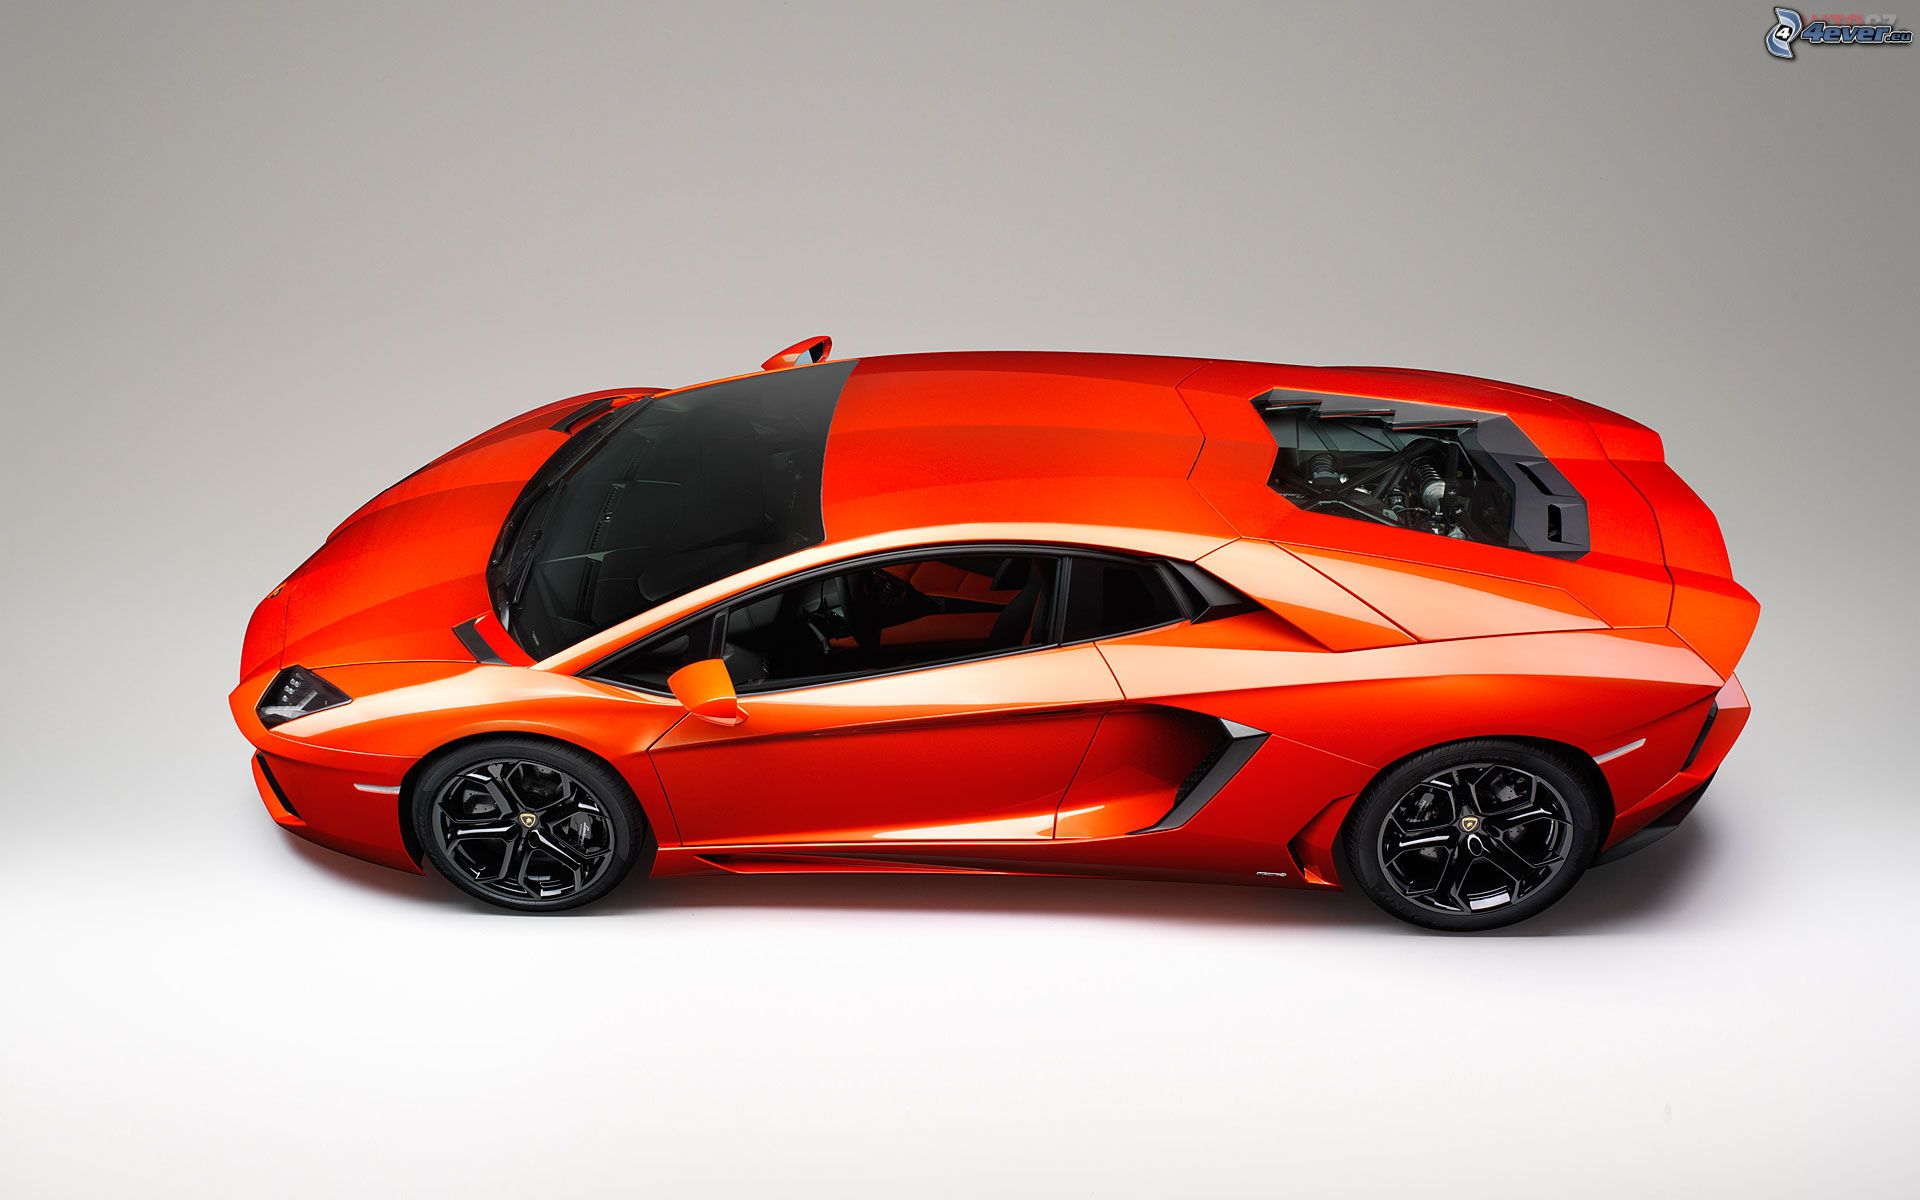 Hintergrundbild von Lamborghini